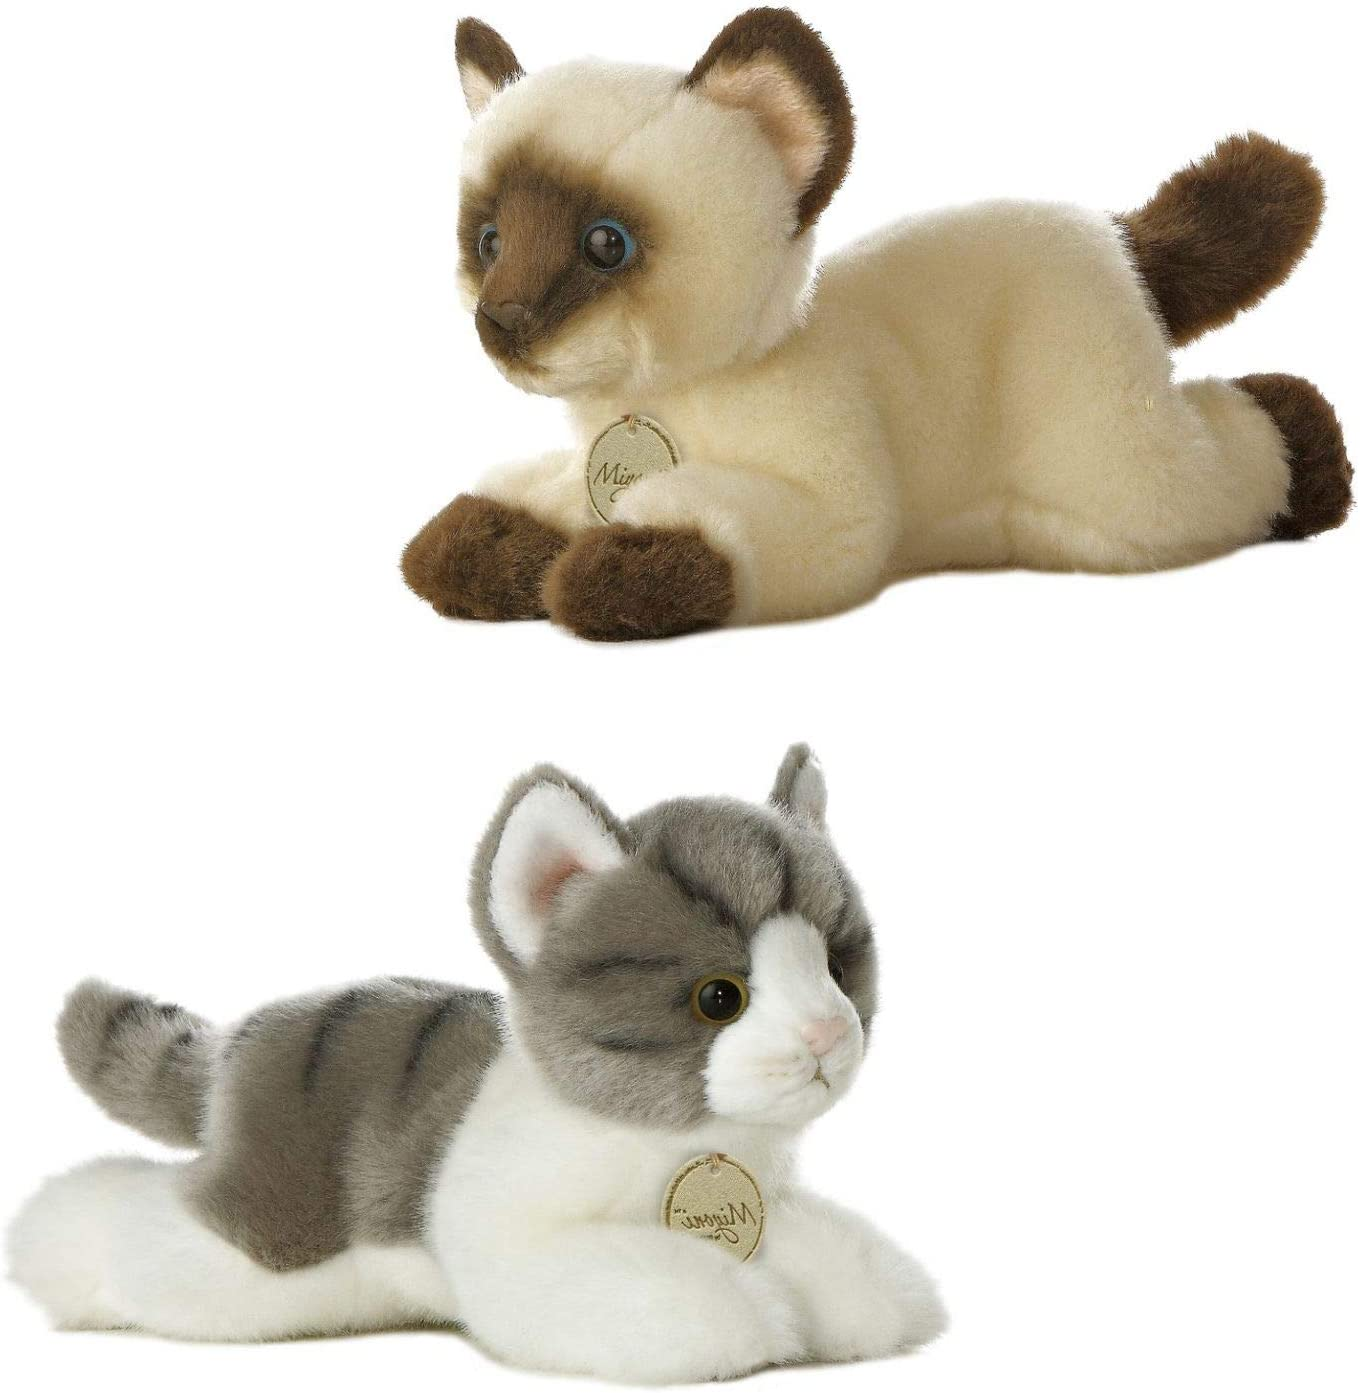 BBA SUNRISE, AURORA Bundle of 2 Cute Stuffed Cats, Stuffed Animals for Baby & Kids, Cat Plush Grey 8